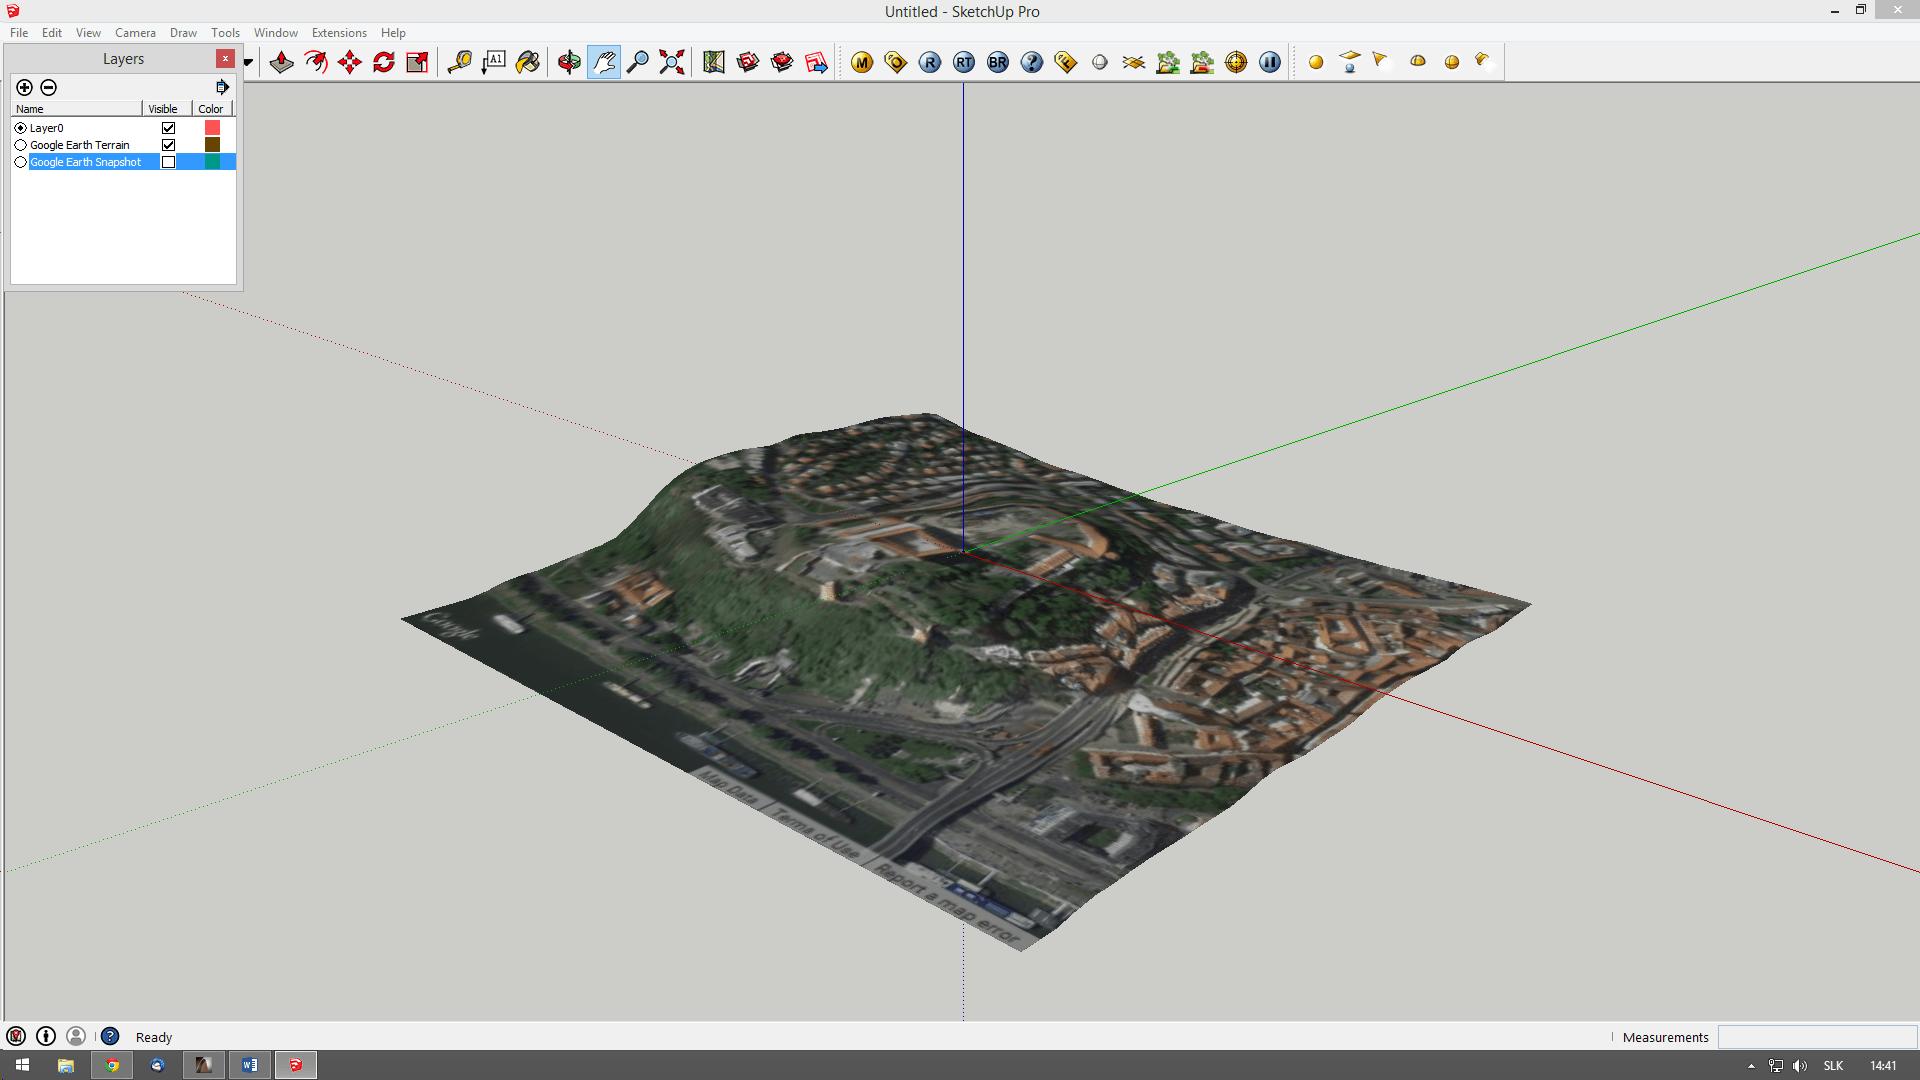 Screenshot-2015-03-11-14.41.11